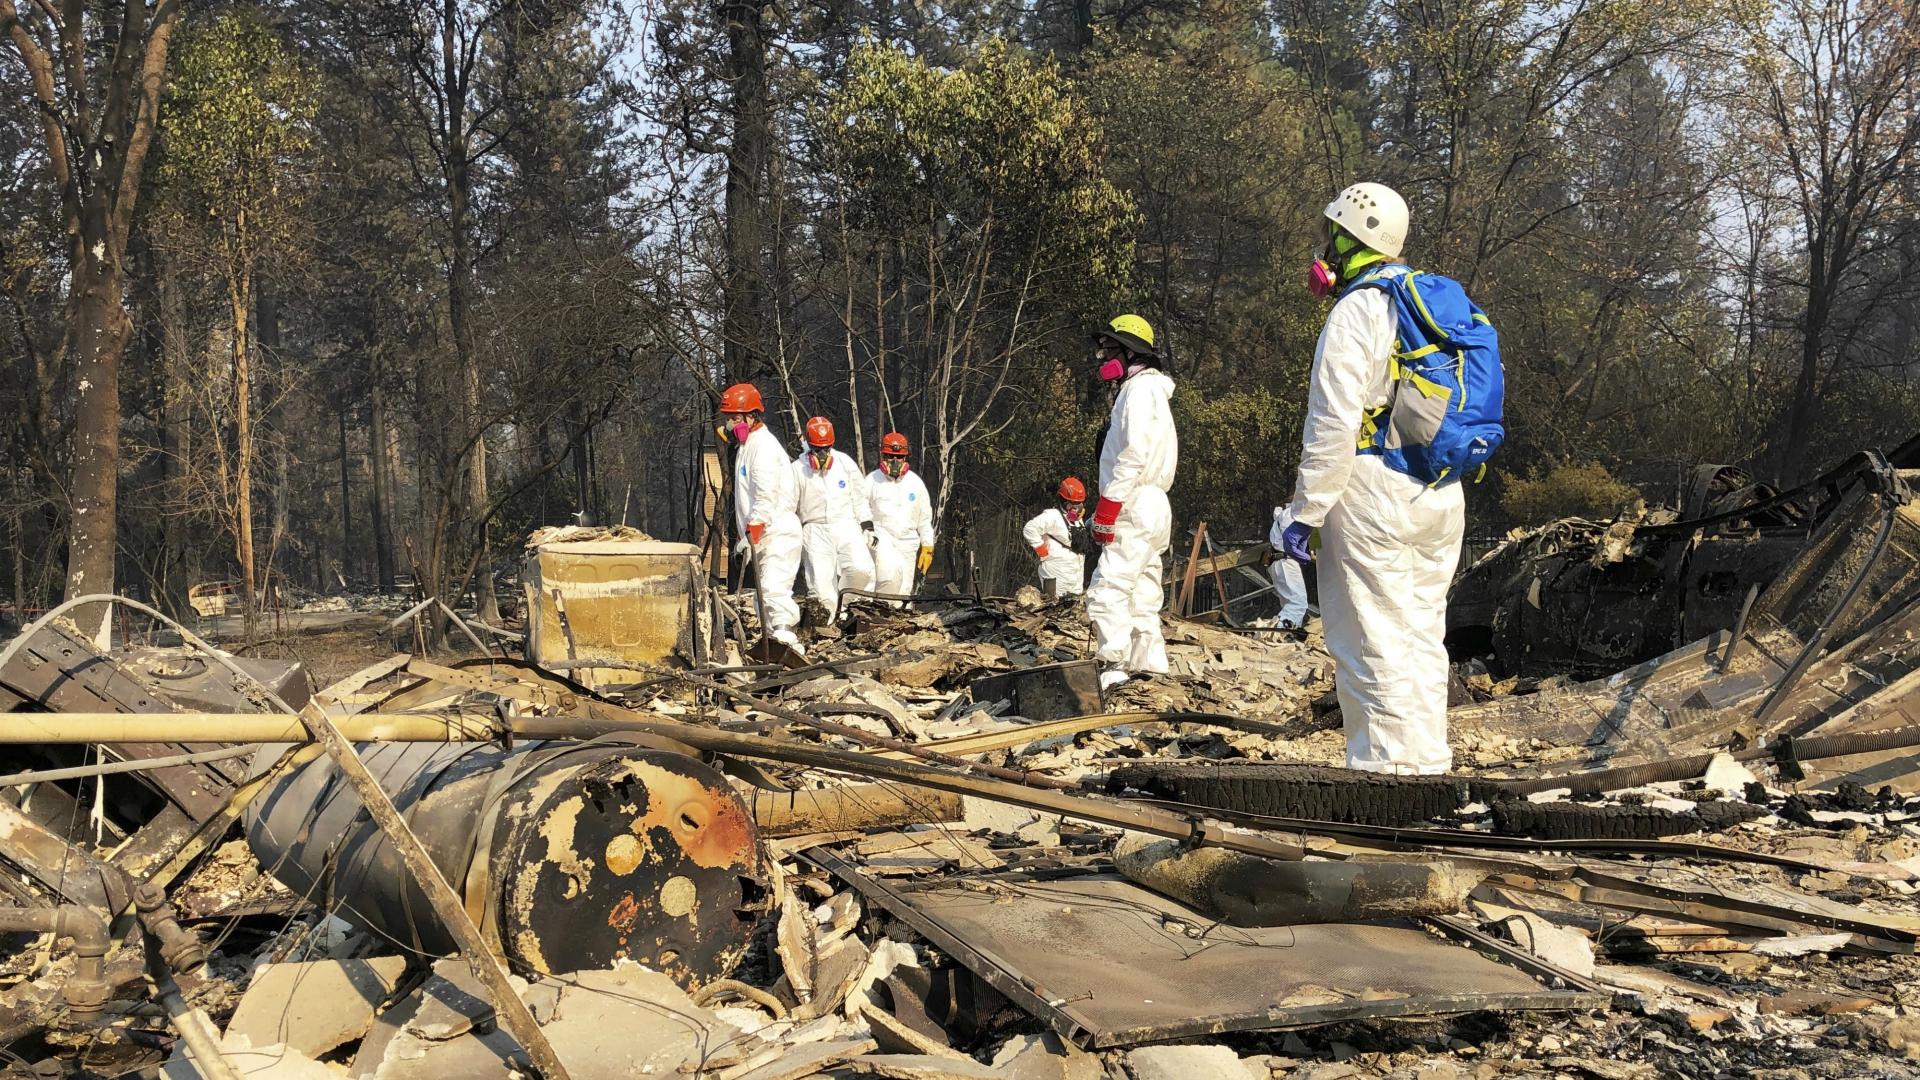 northern california wildfire 111818 AP_1542769550646.jpg.jpg